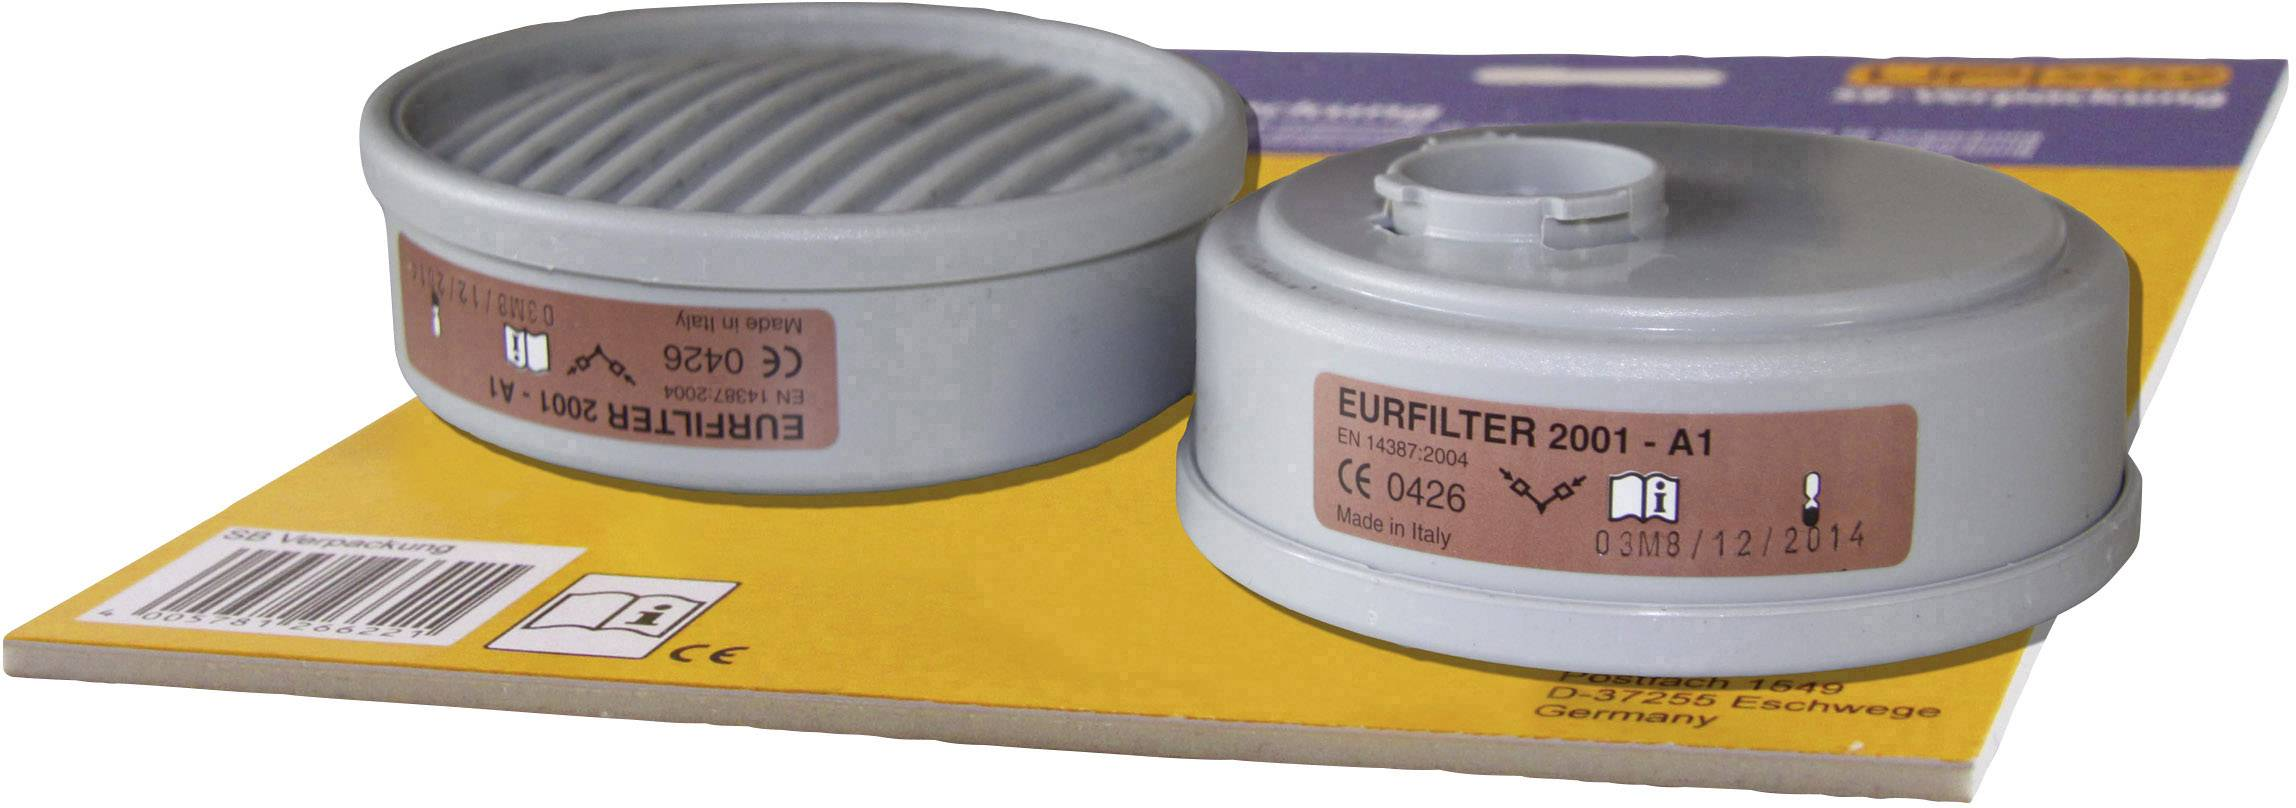 Plynový filtr Upixx EURFILTER ETNA 26244, A1, 2 ks